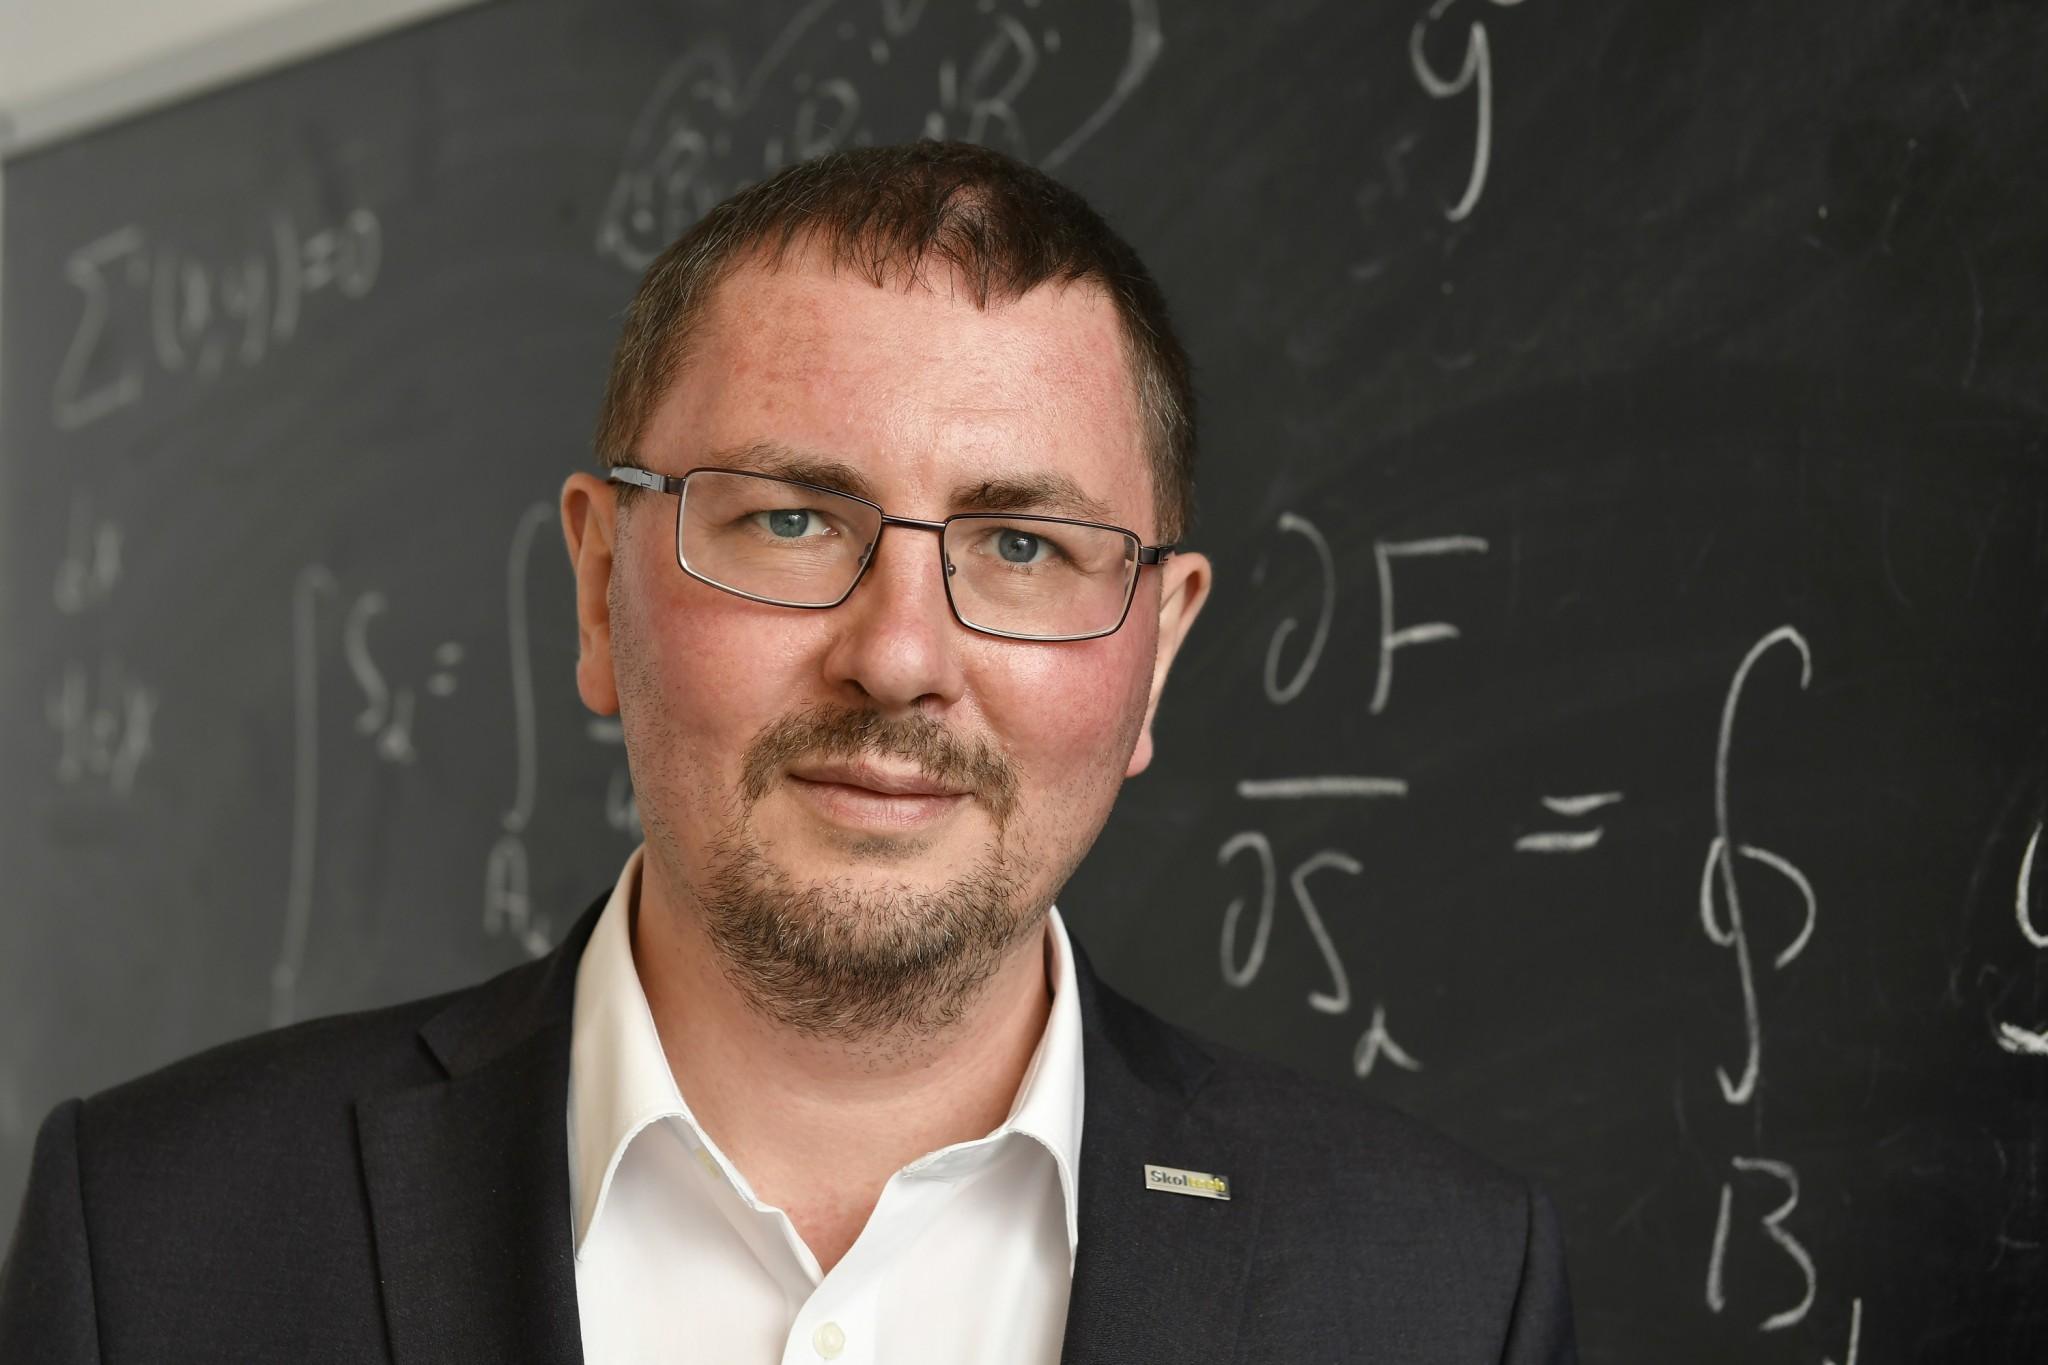 Skoltech Professor Maxim Fedorov. Photo: Skoltech.